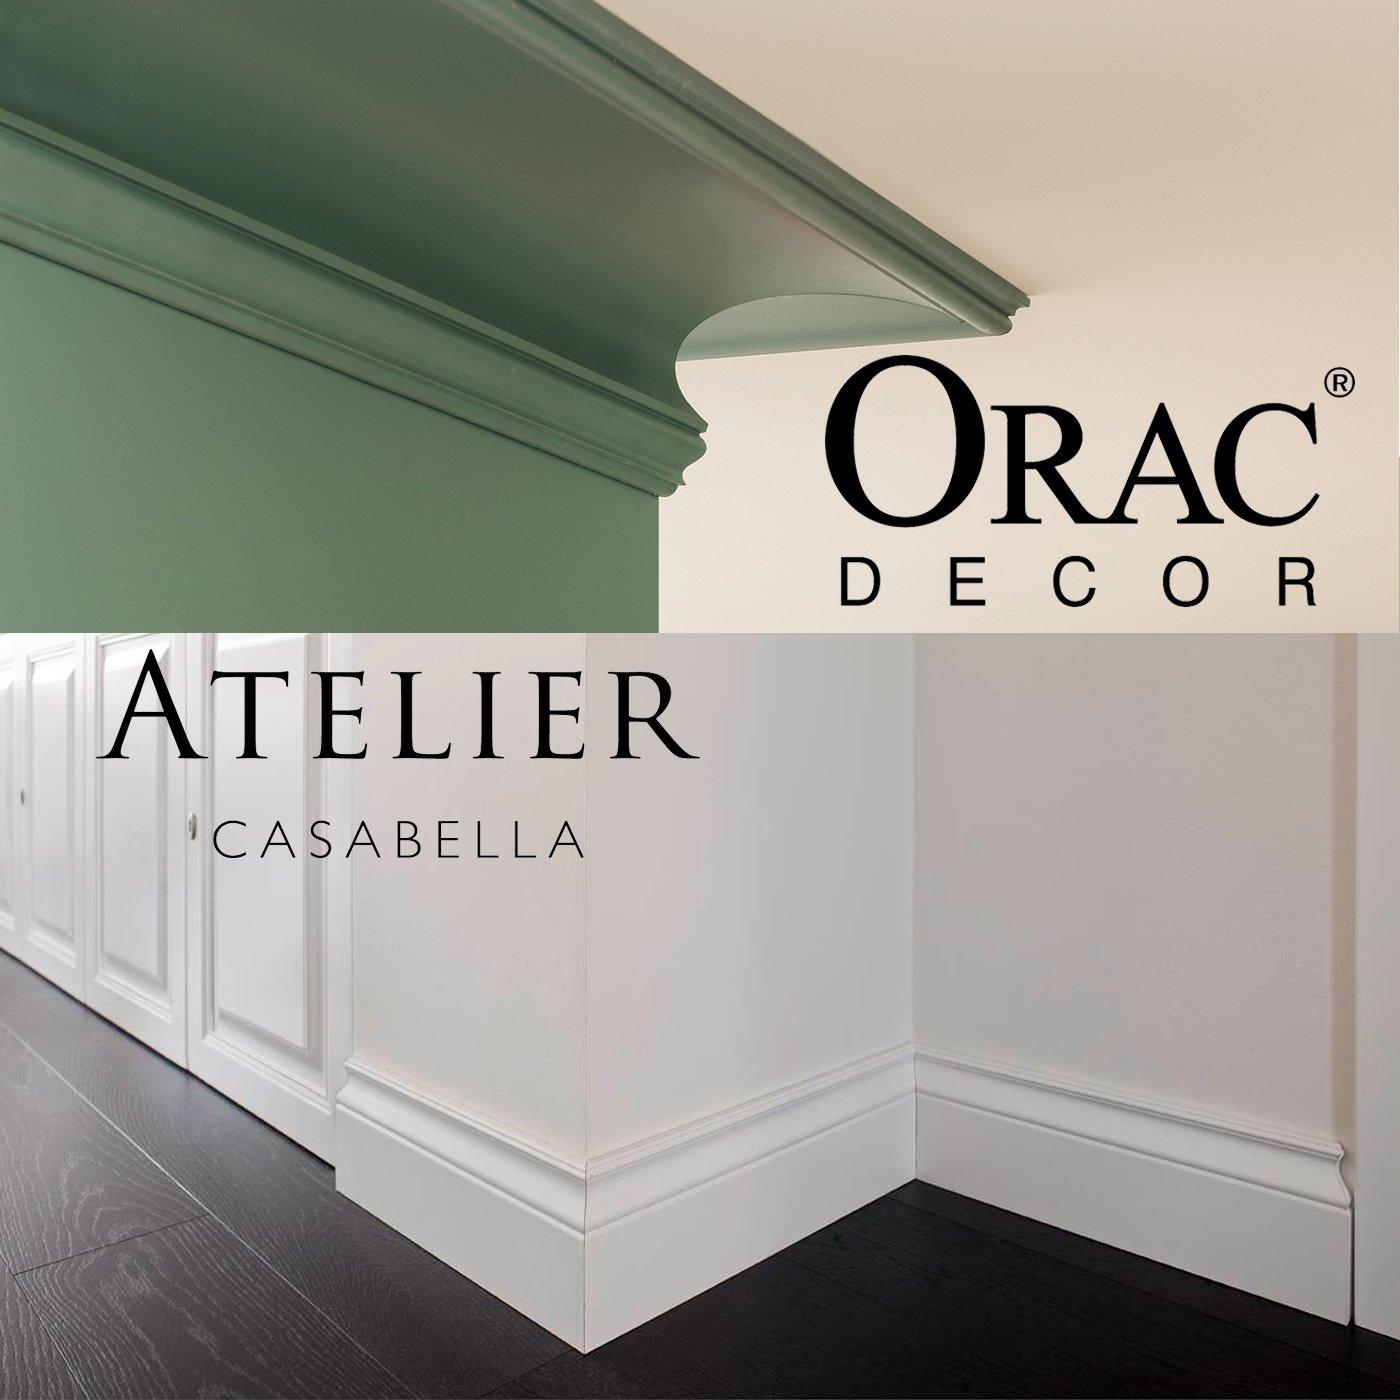 ORAC_ATELIER